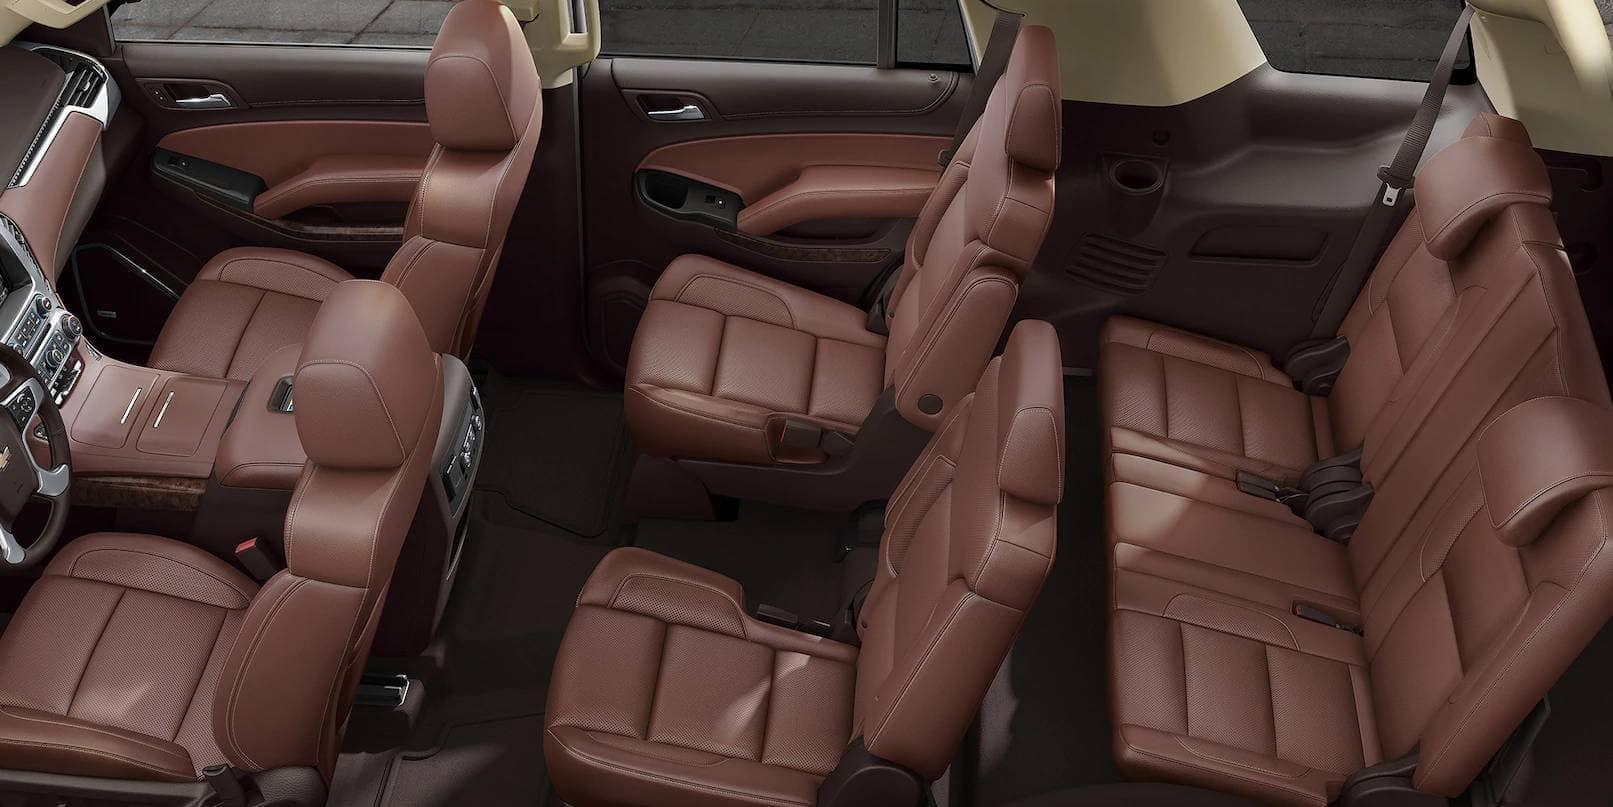 2019-Chevrolet-Tahoe-Interior-2